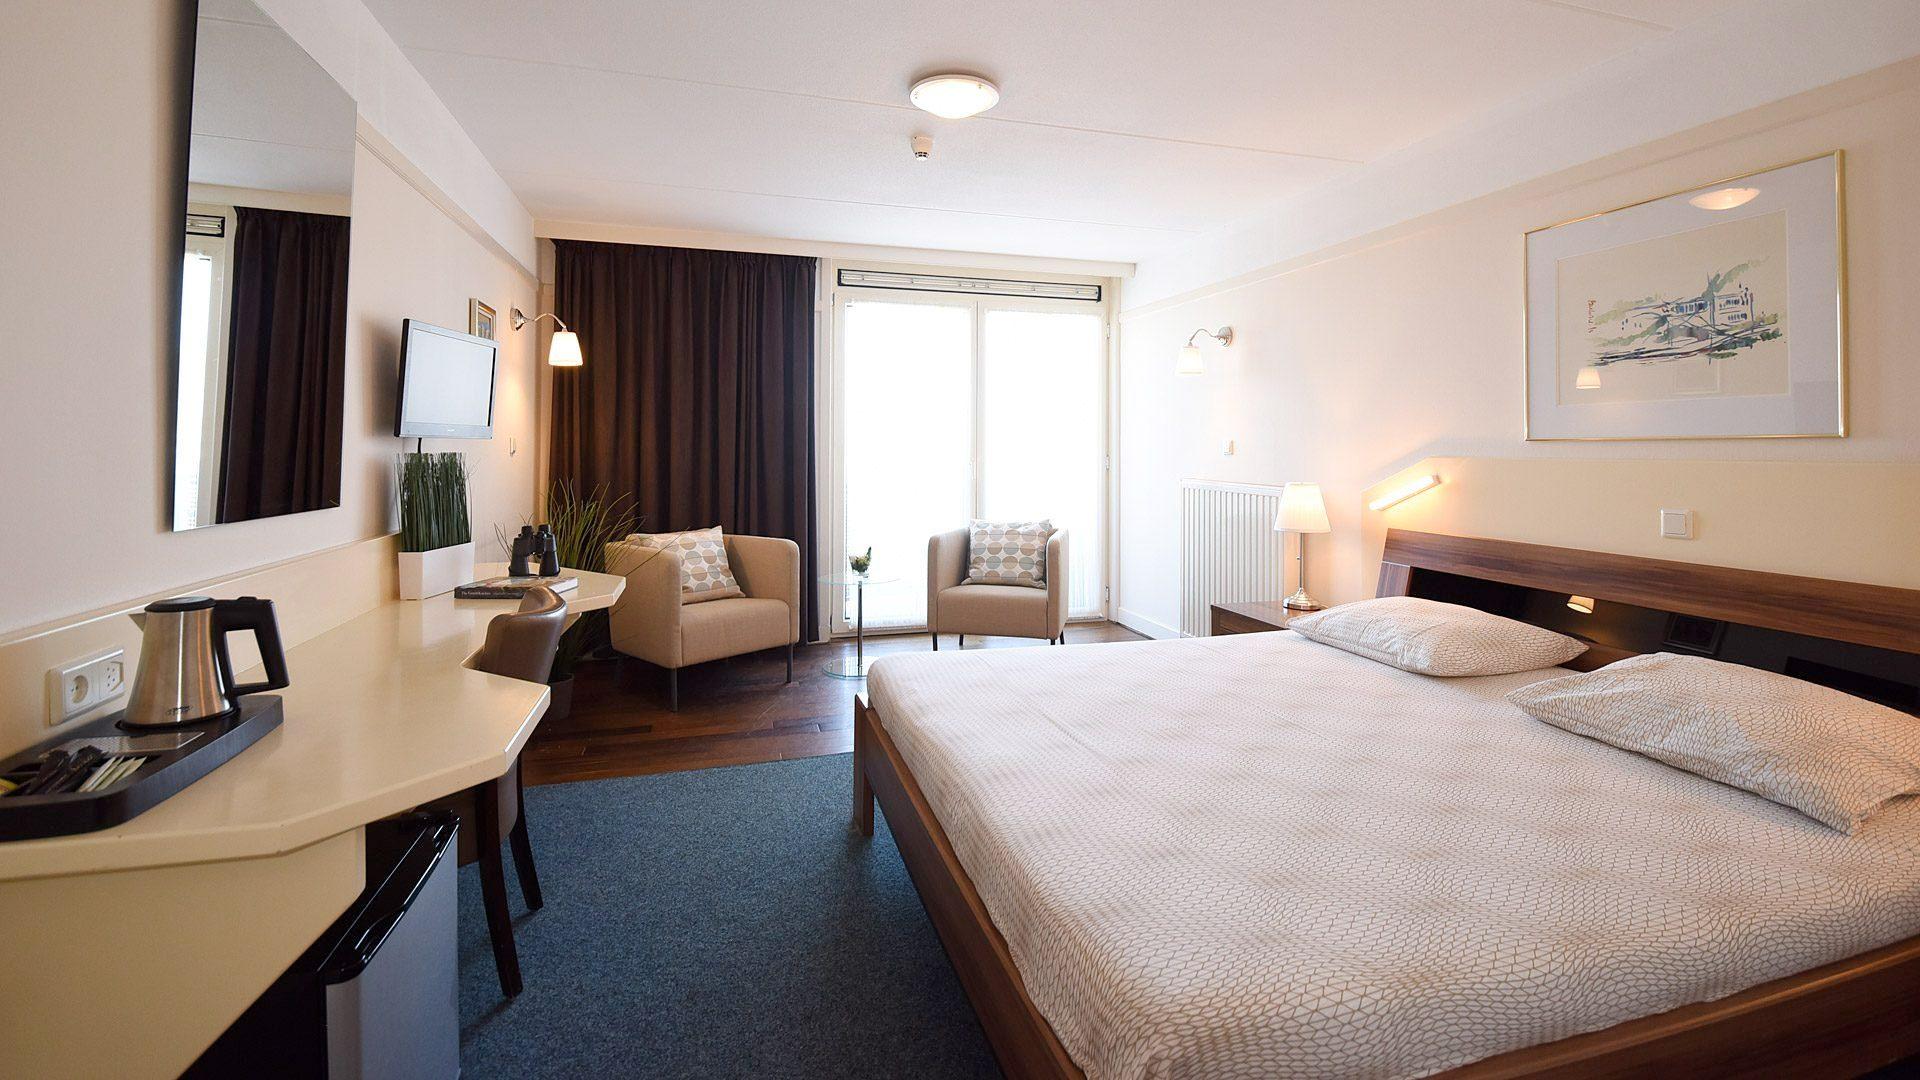 Hotel Nehalennia - Hotel Nehalennia